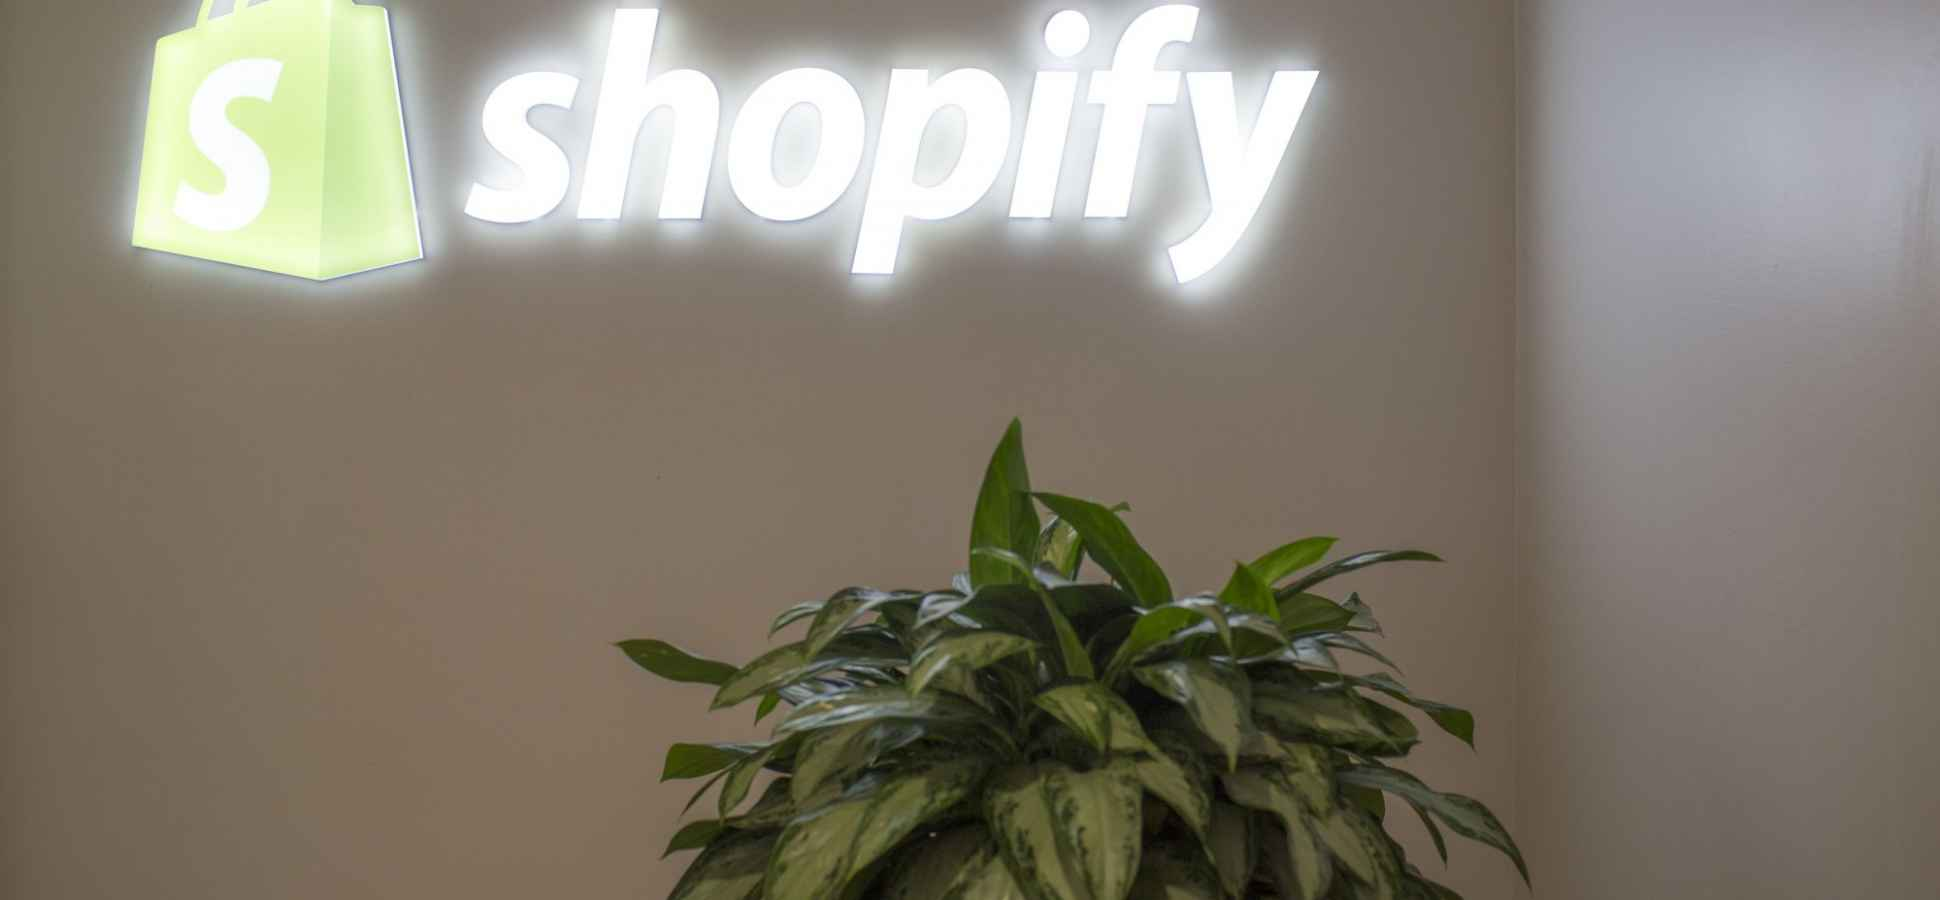 Shopify Lost Over $9 Million Last Quarter